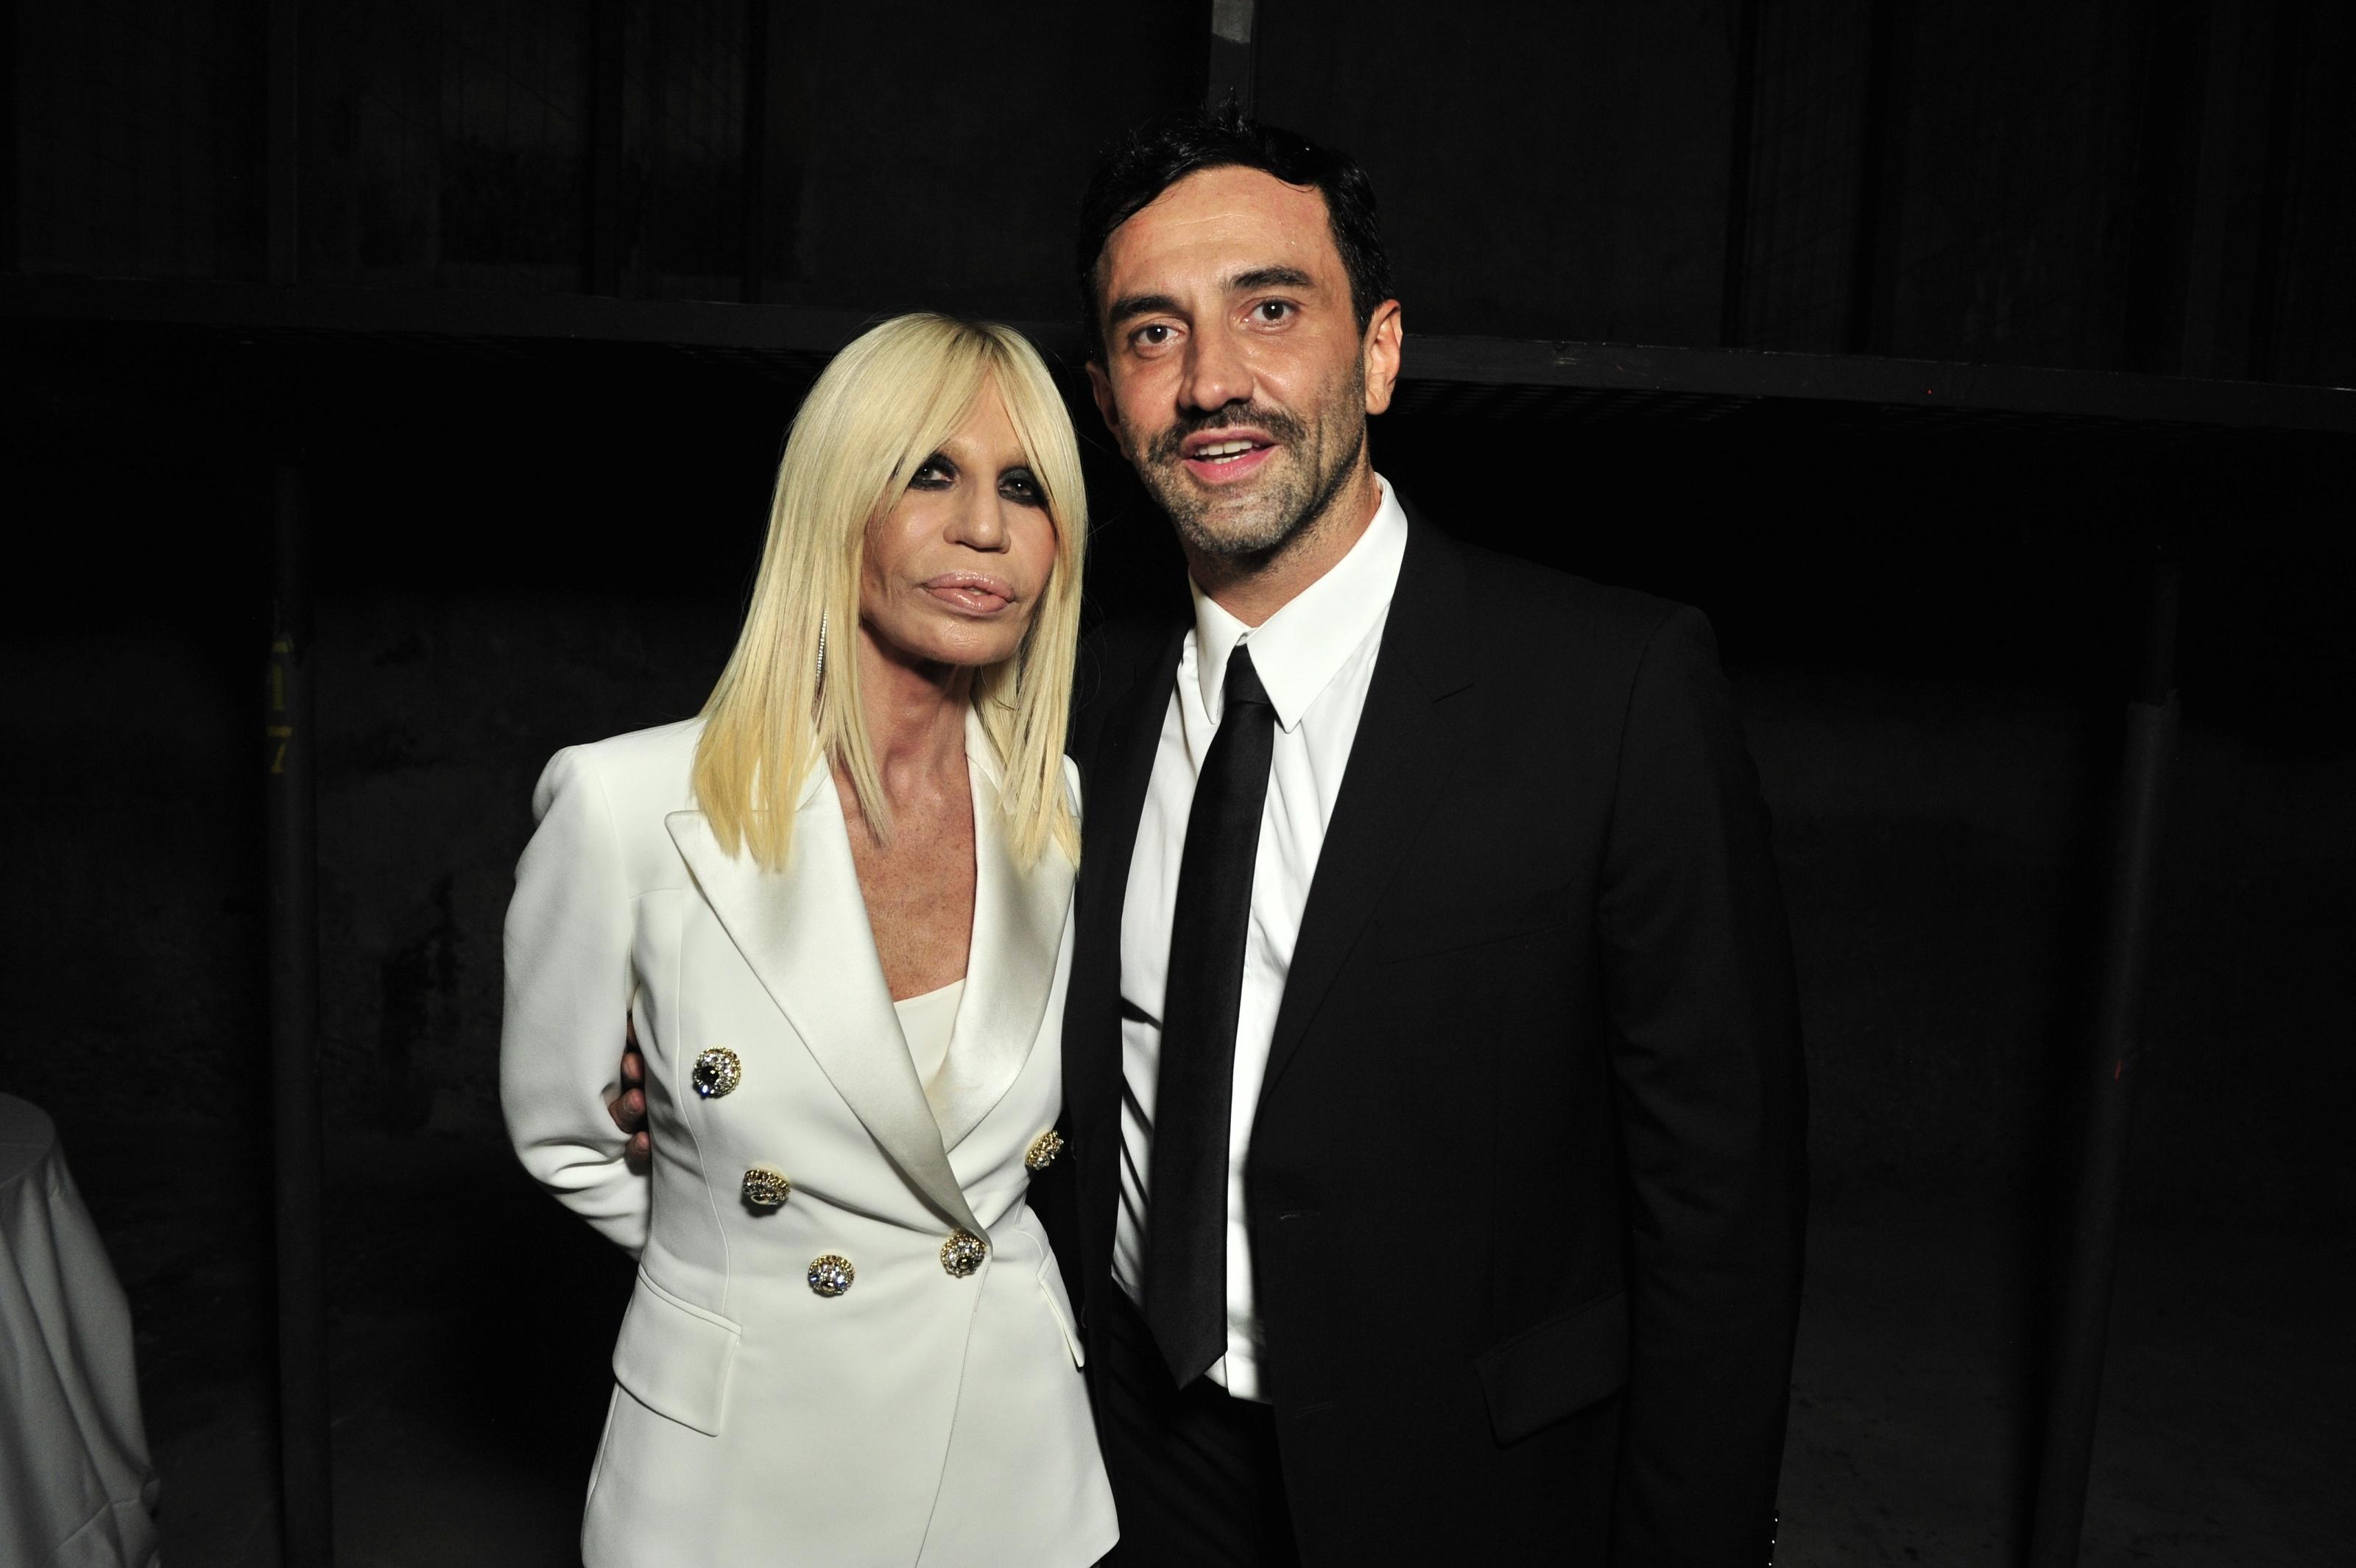 Donatella Versace and Riccardo TisciGivenchy: #GRTmilano 17 Party, Spring Summer 2016, Milan Fashion Week, Italy - 25 Sep 2015